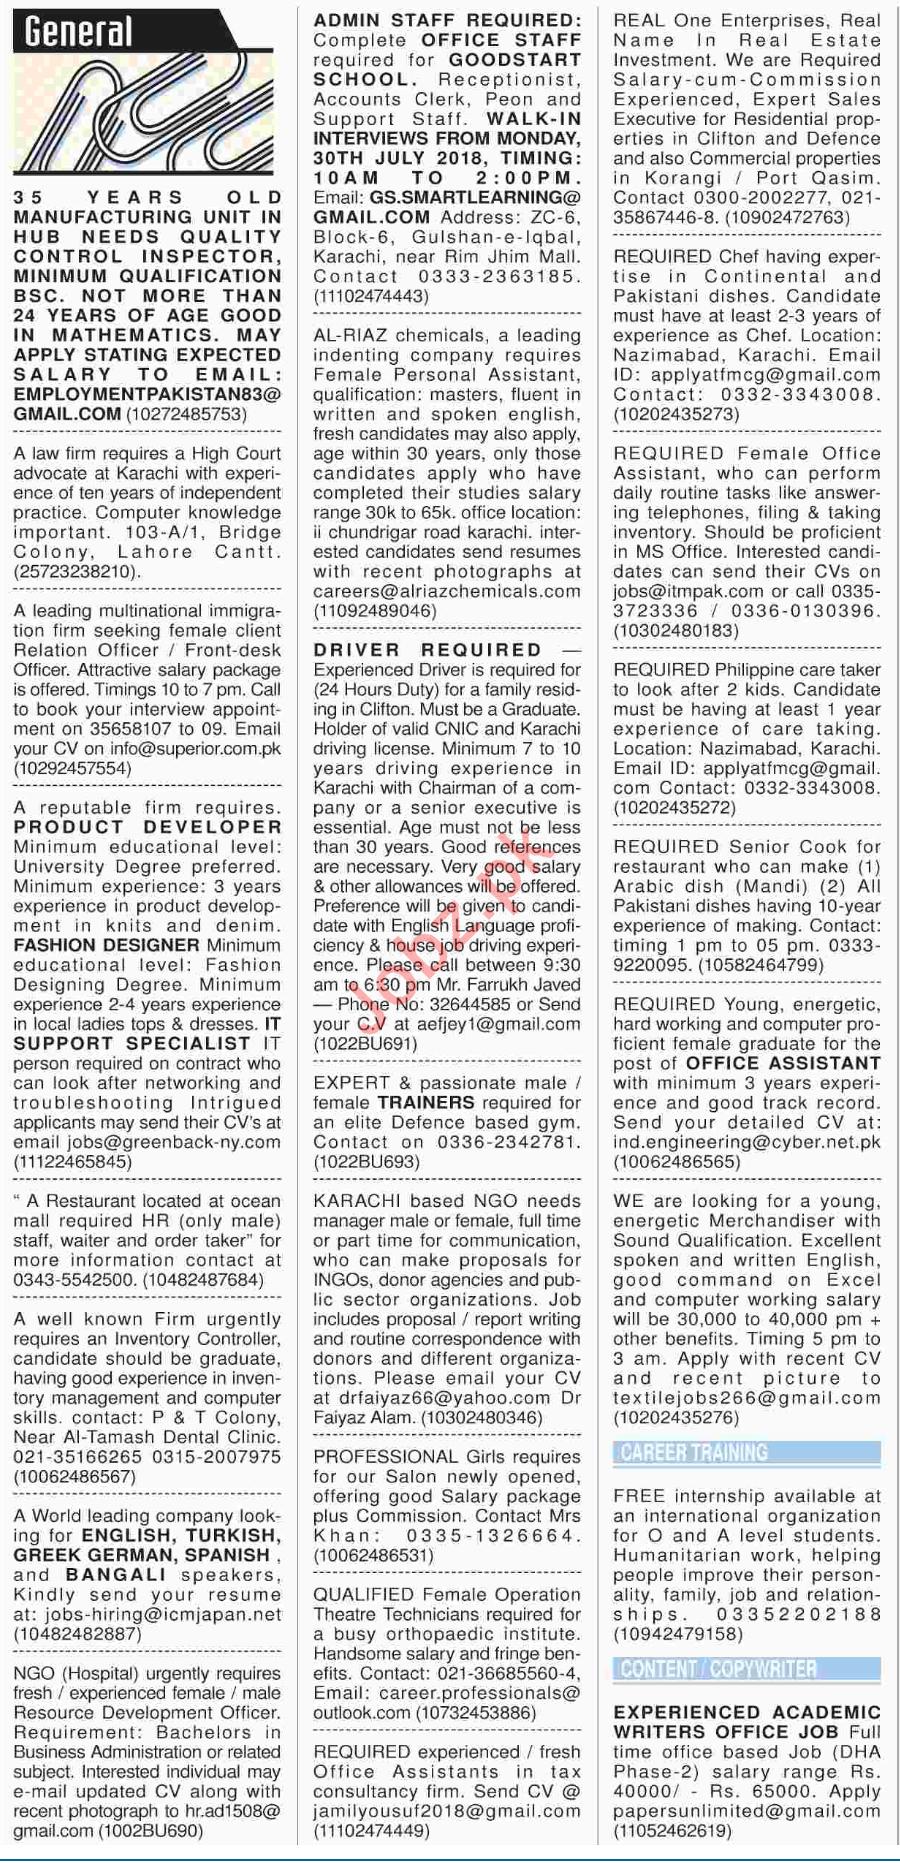 General Jobs 2018 in Karachi 2019 Job Advertisement Pakistan